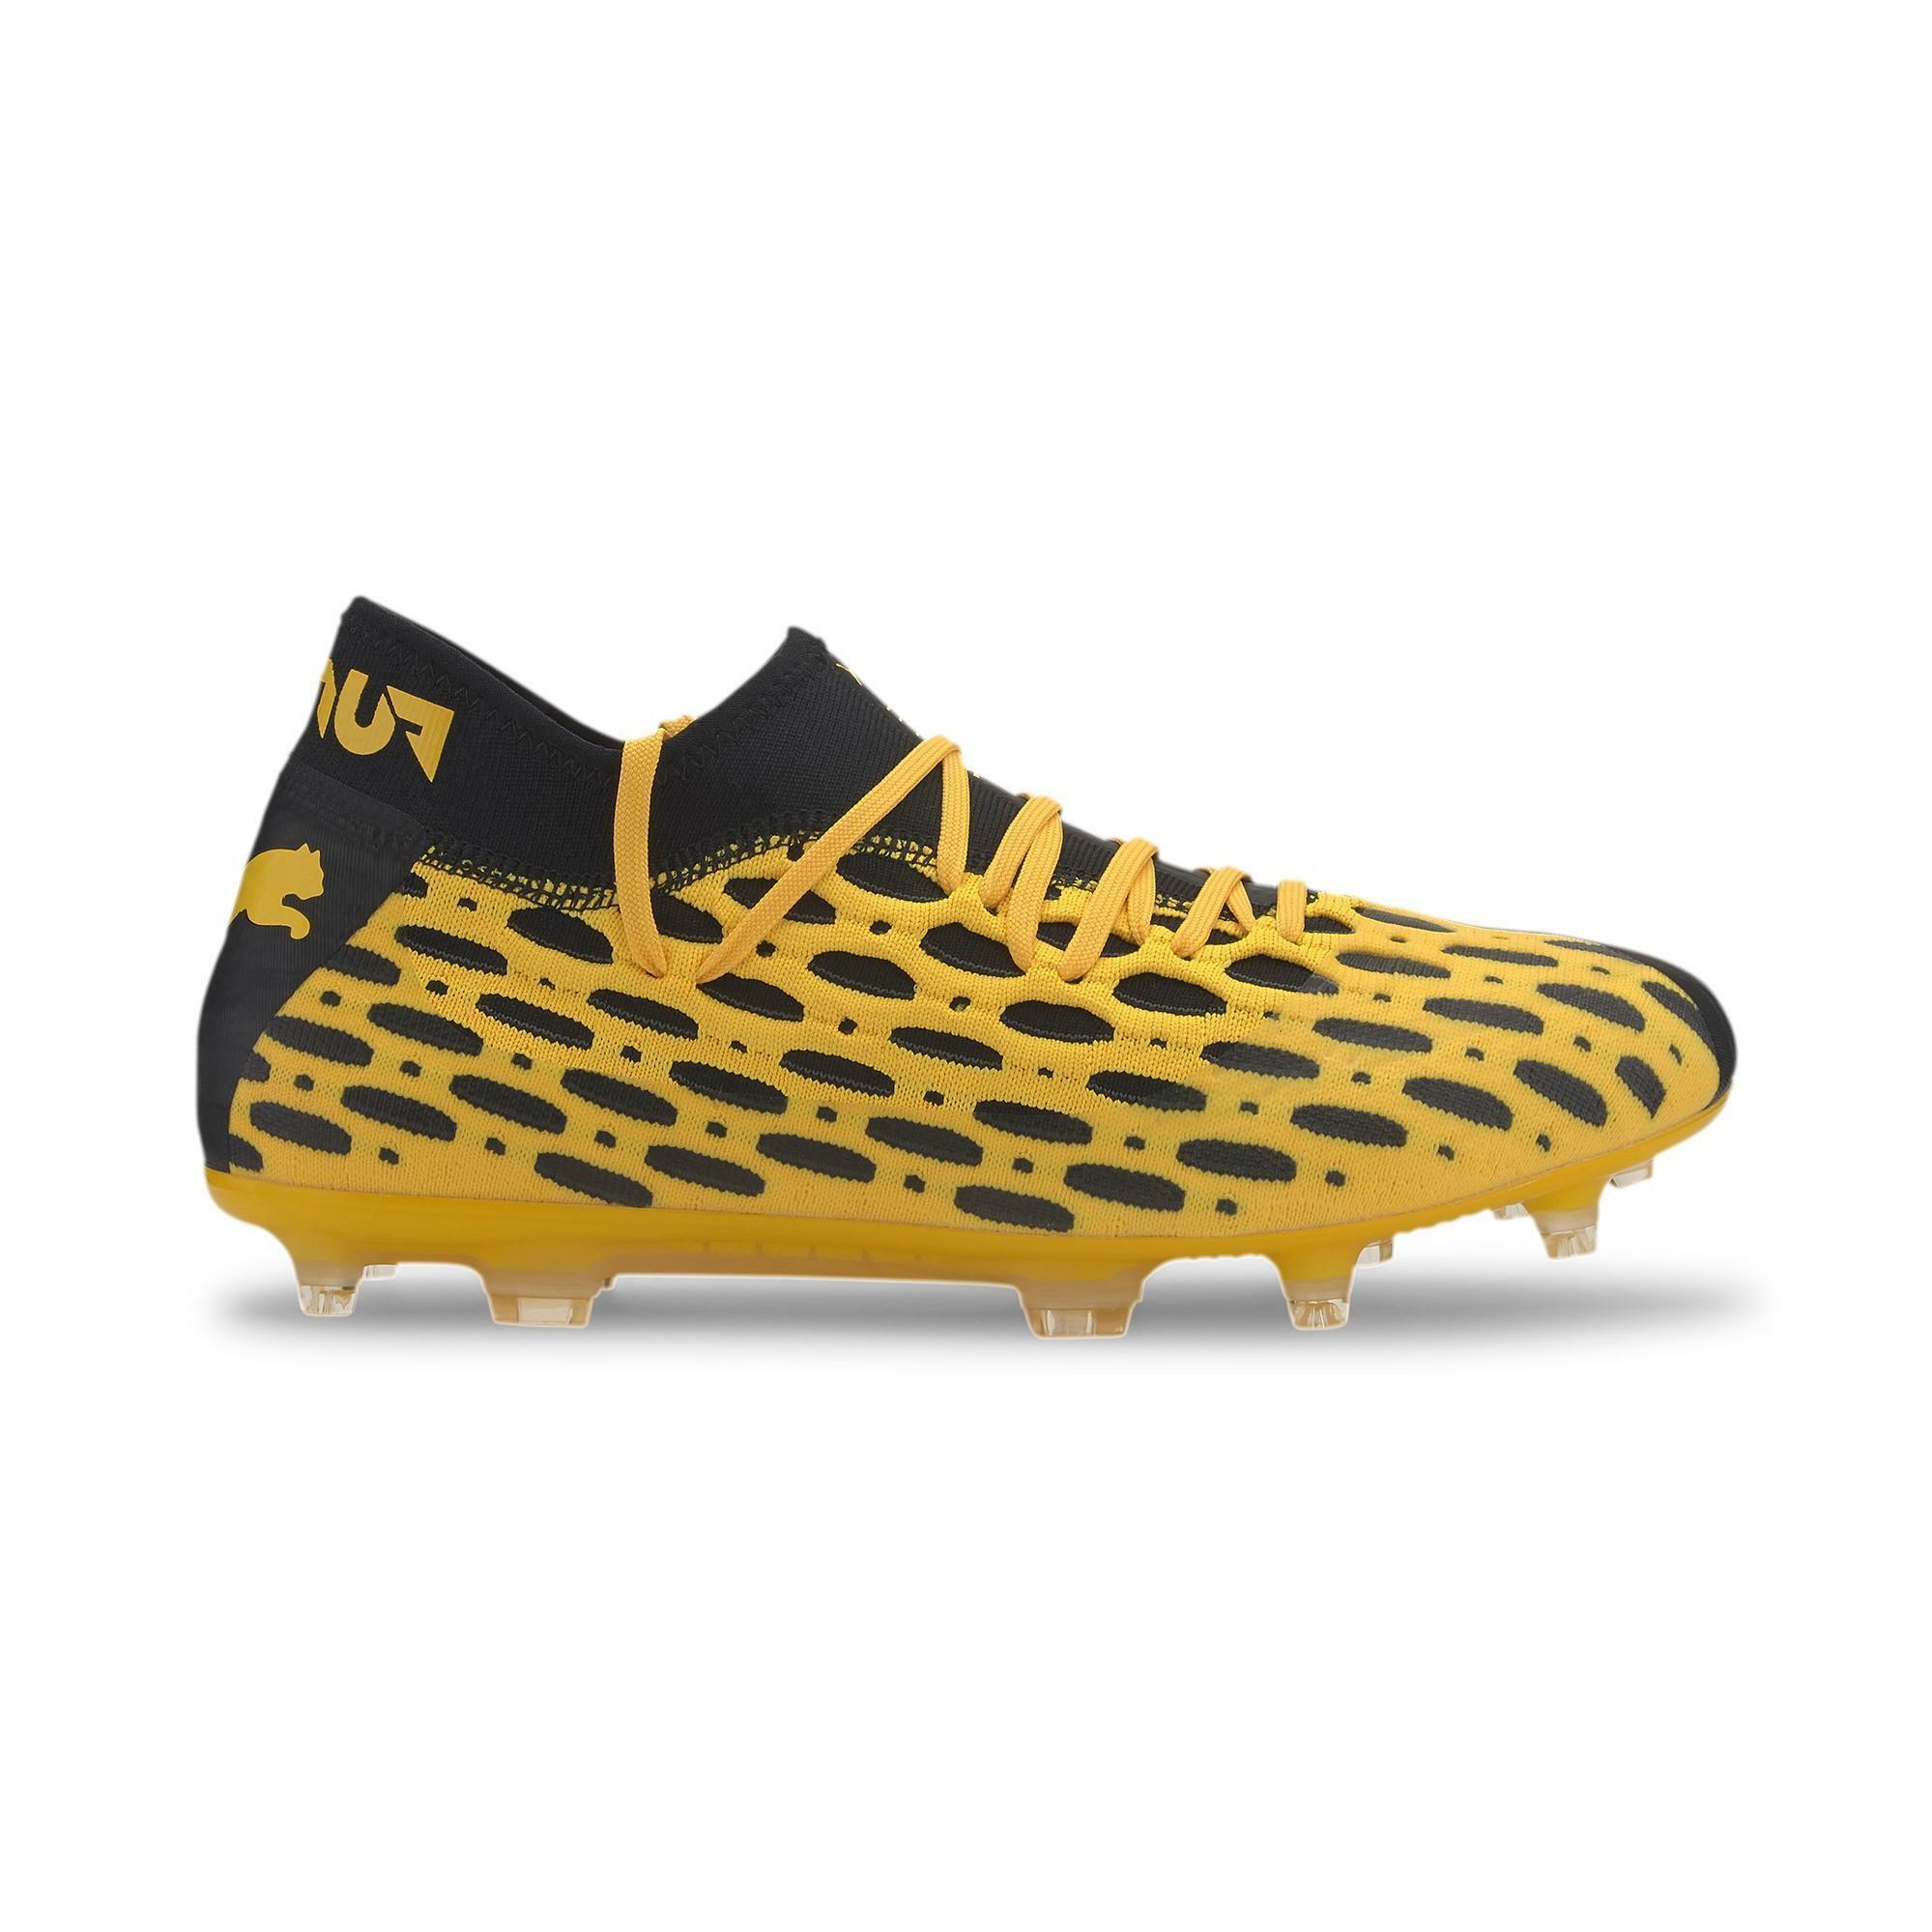 puma puma scarpa calcio future 5.2 netfit fg